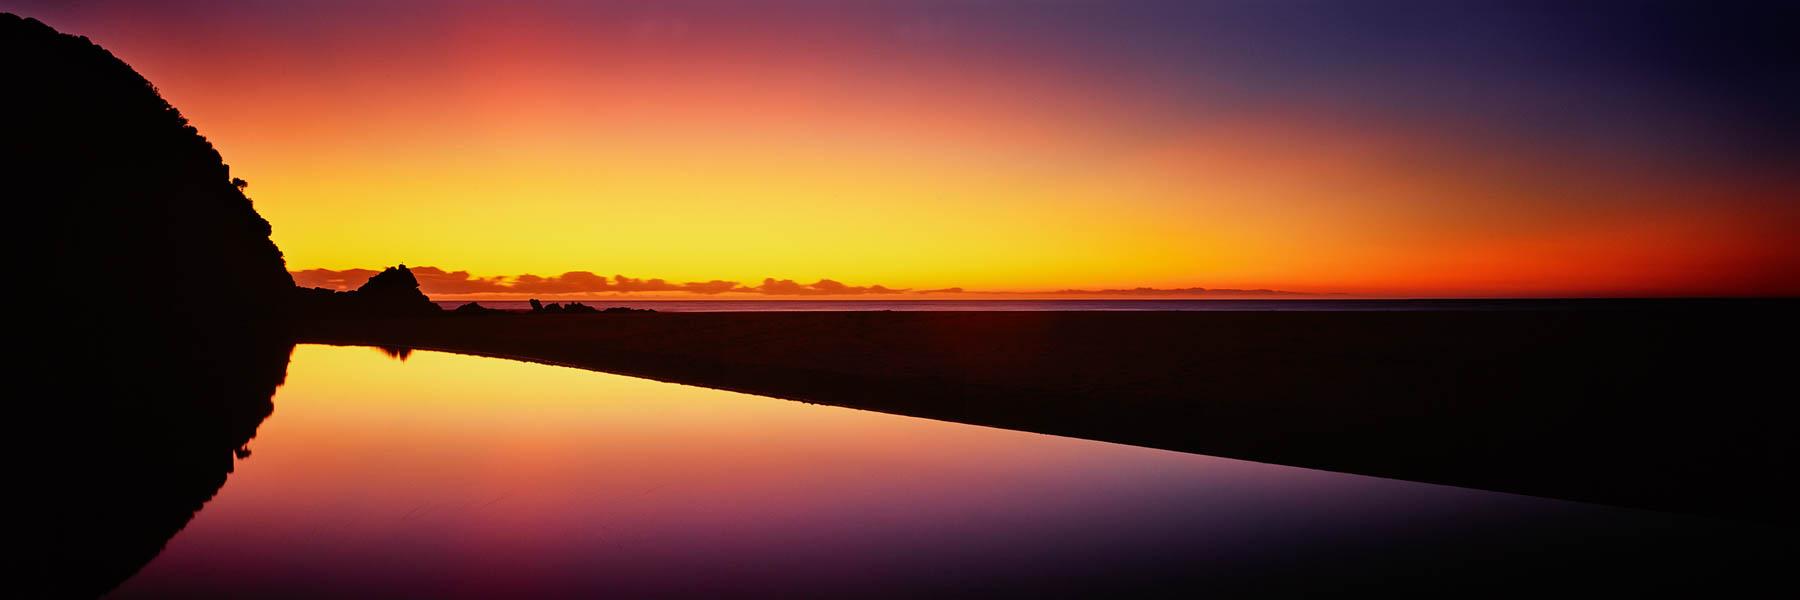 A glorious sunrise at Shipwreck Creek in Croajingalong National Park, Victoria, Australia.